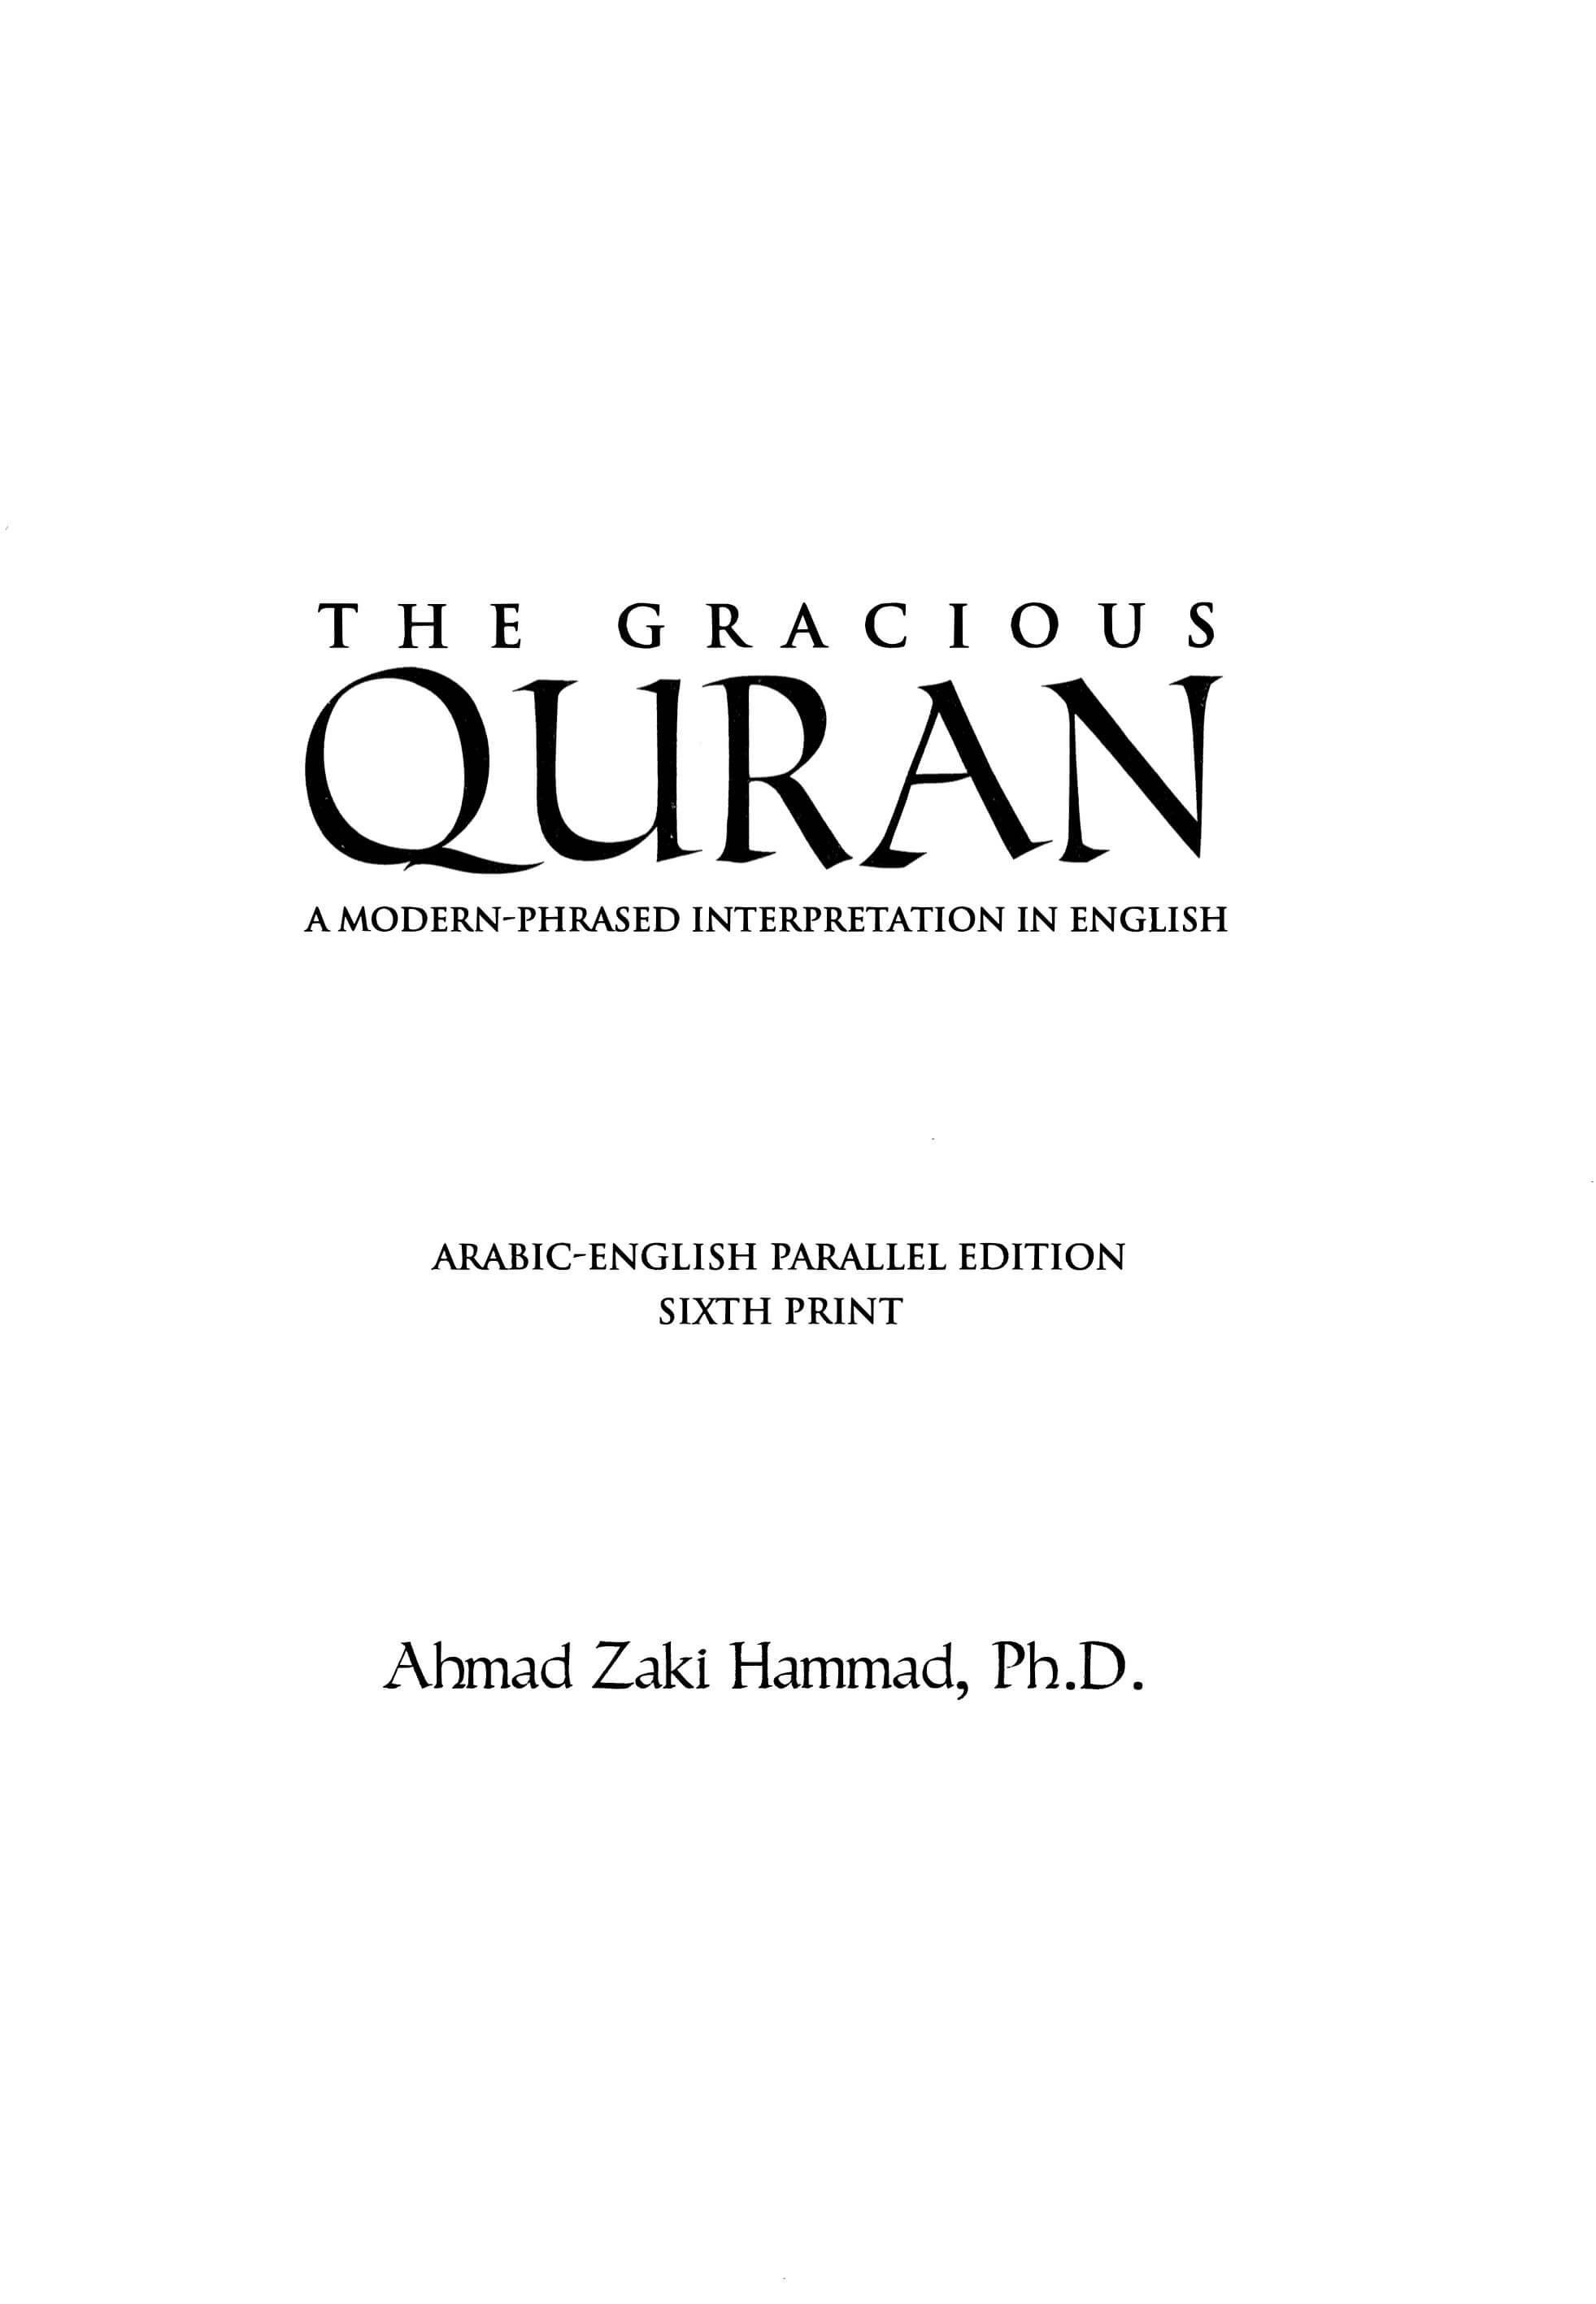 Ahmed Zaki Hammad 2008 Quran Explorer, Page 3